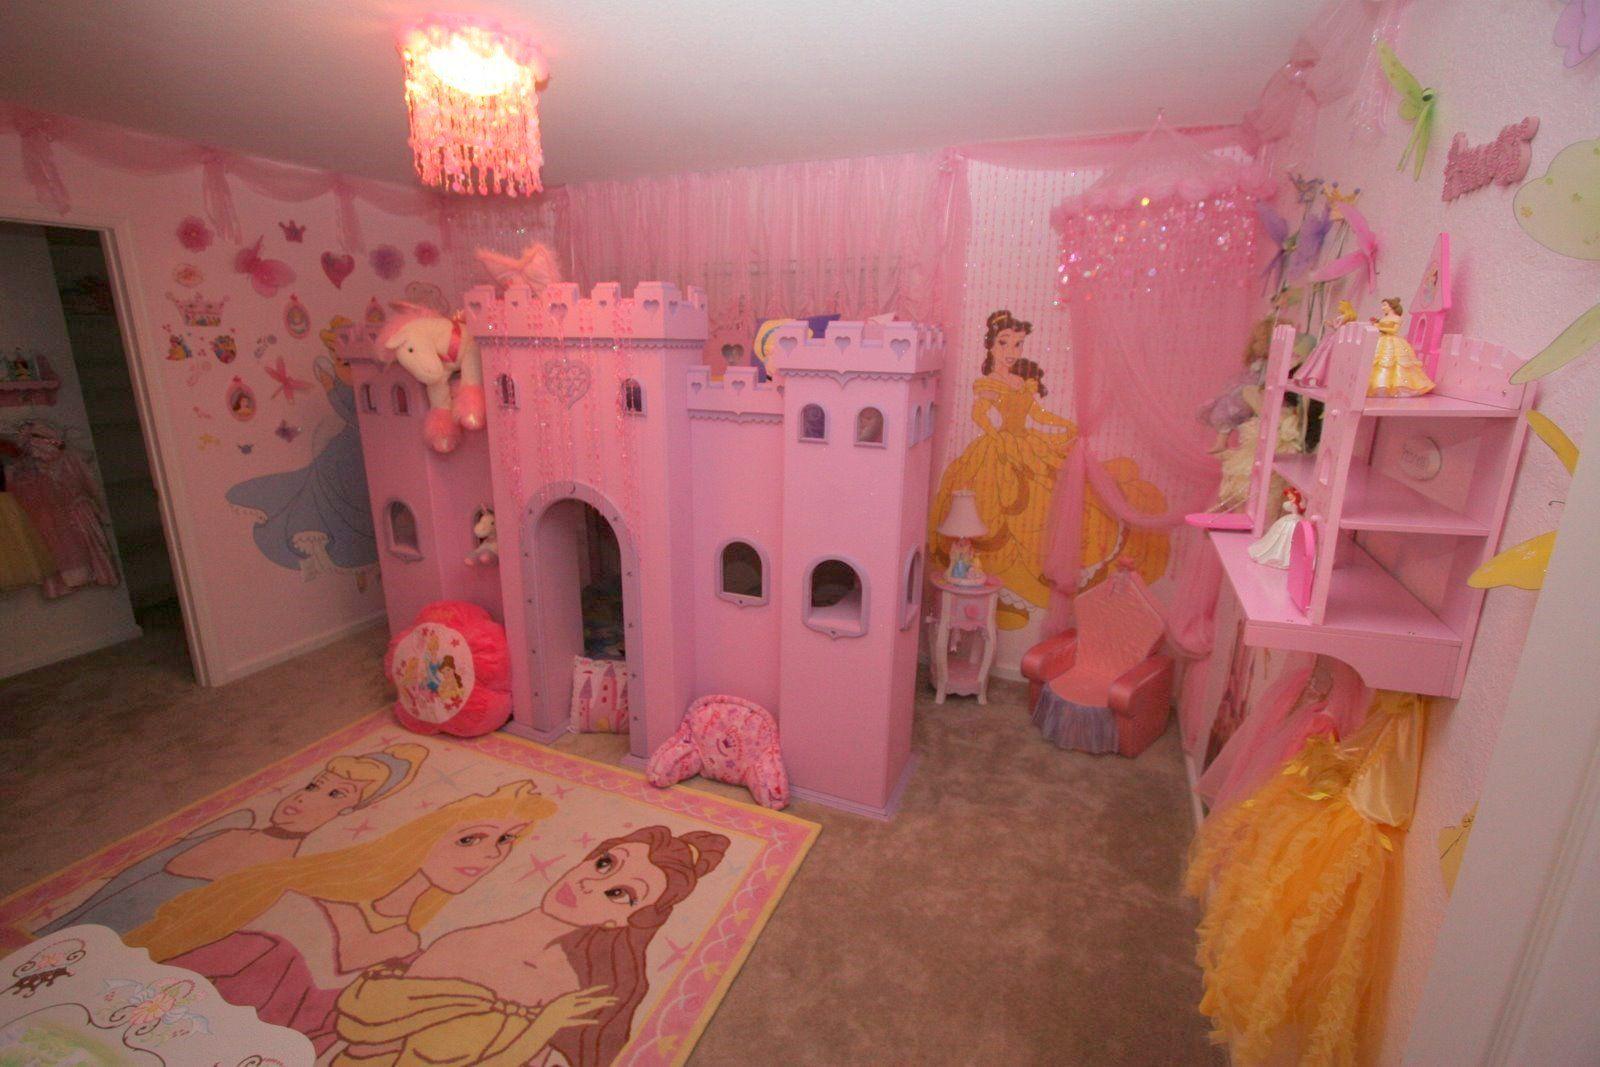 Bedroom Disney Princess Bedroom Decor Disney Princess Bedroom Decor Disney Princess Bedroom Princess Bedroom Decor Disney Princess Room